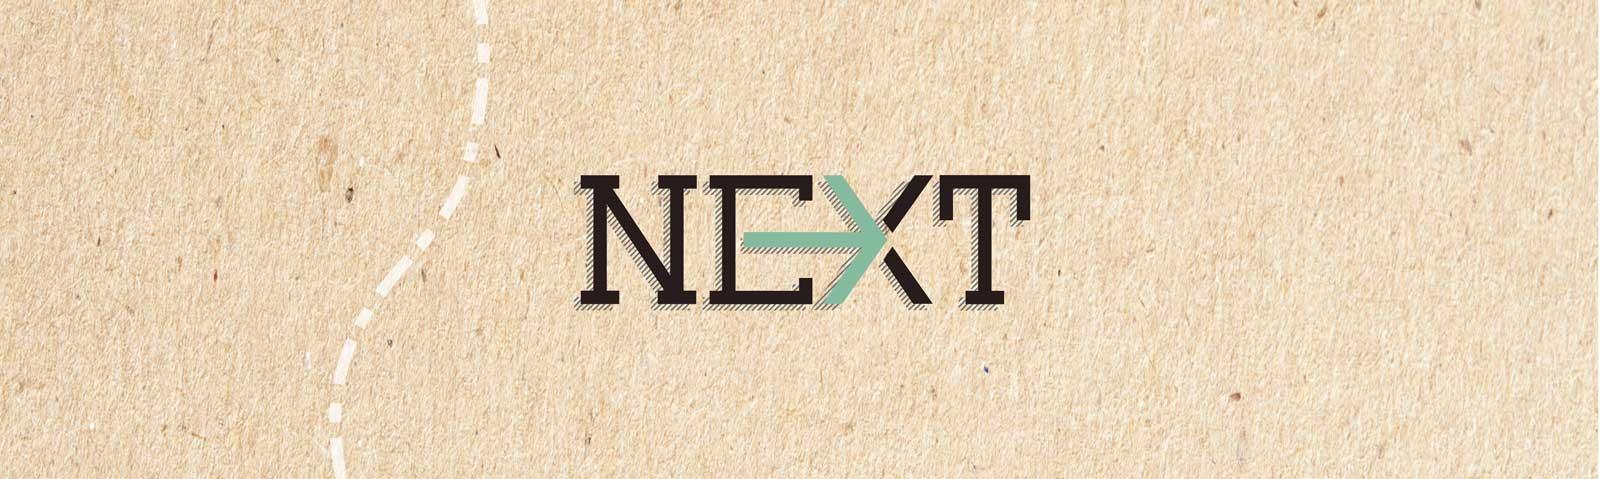 Nextbanner.jpg